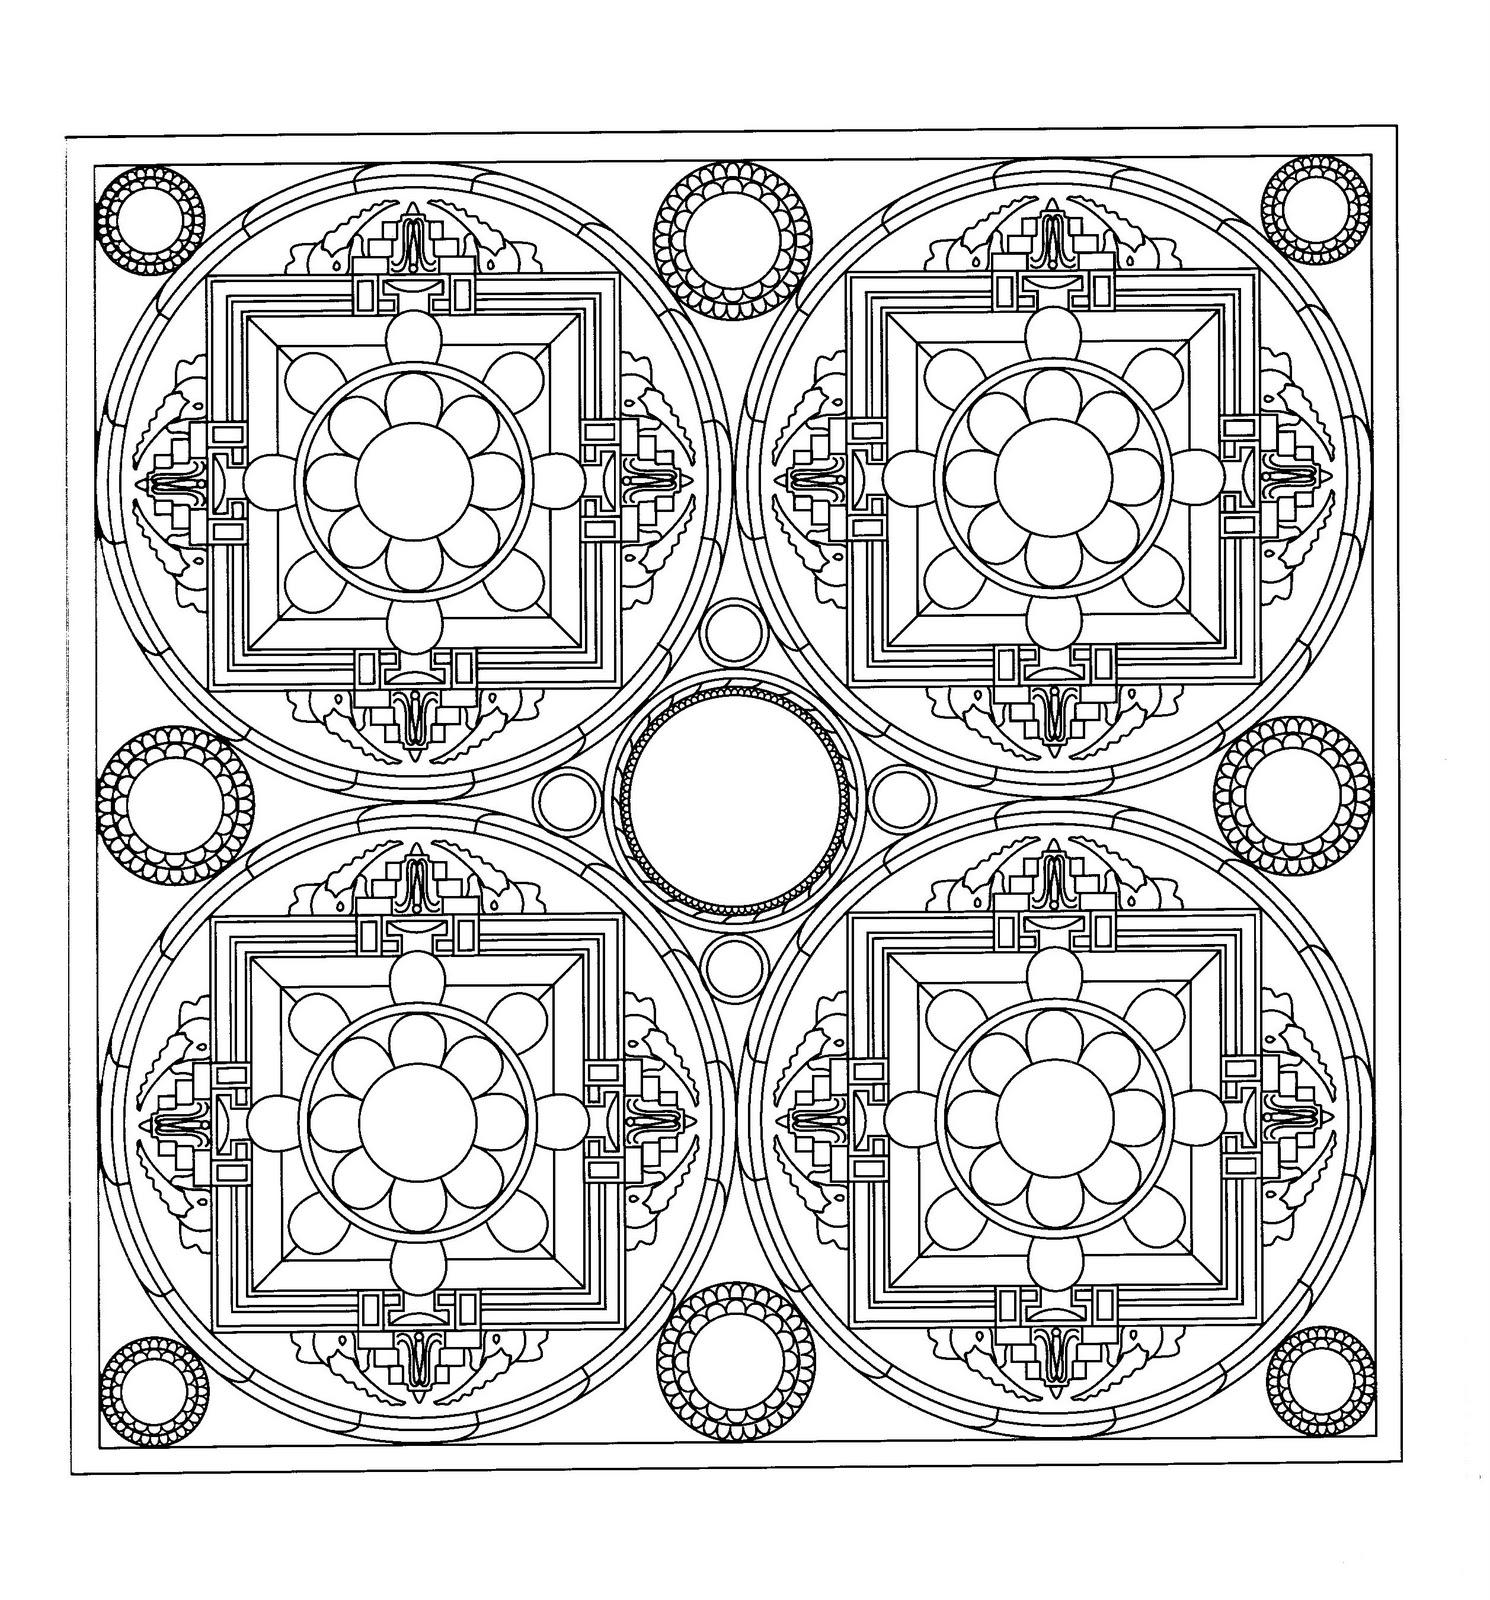 mandala coloring pages pinterest | Mandalas Para Pintar: Mandala mosaico